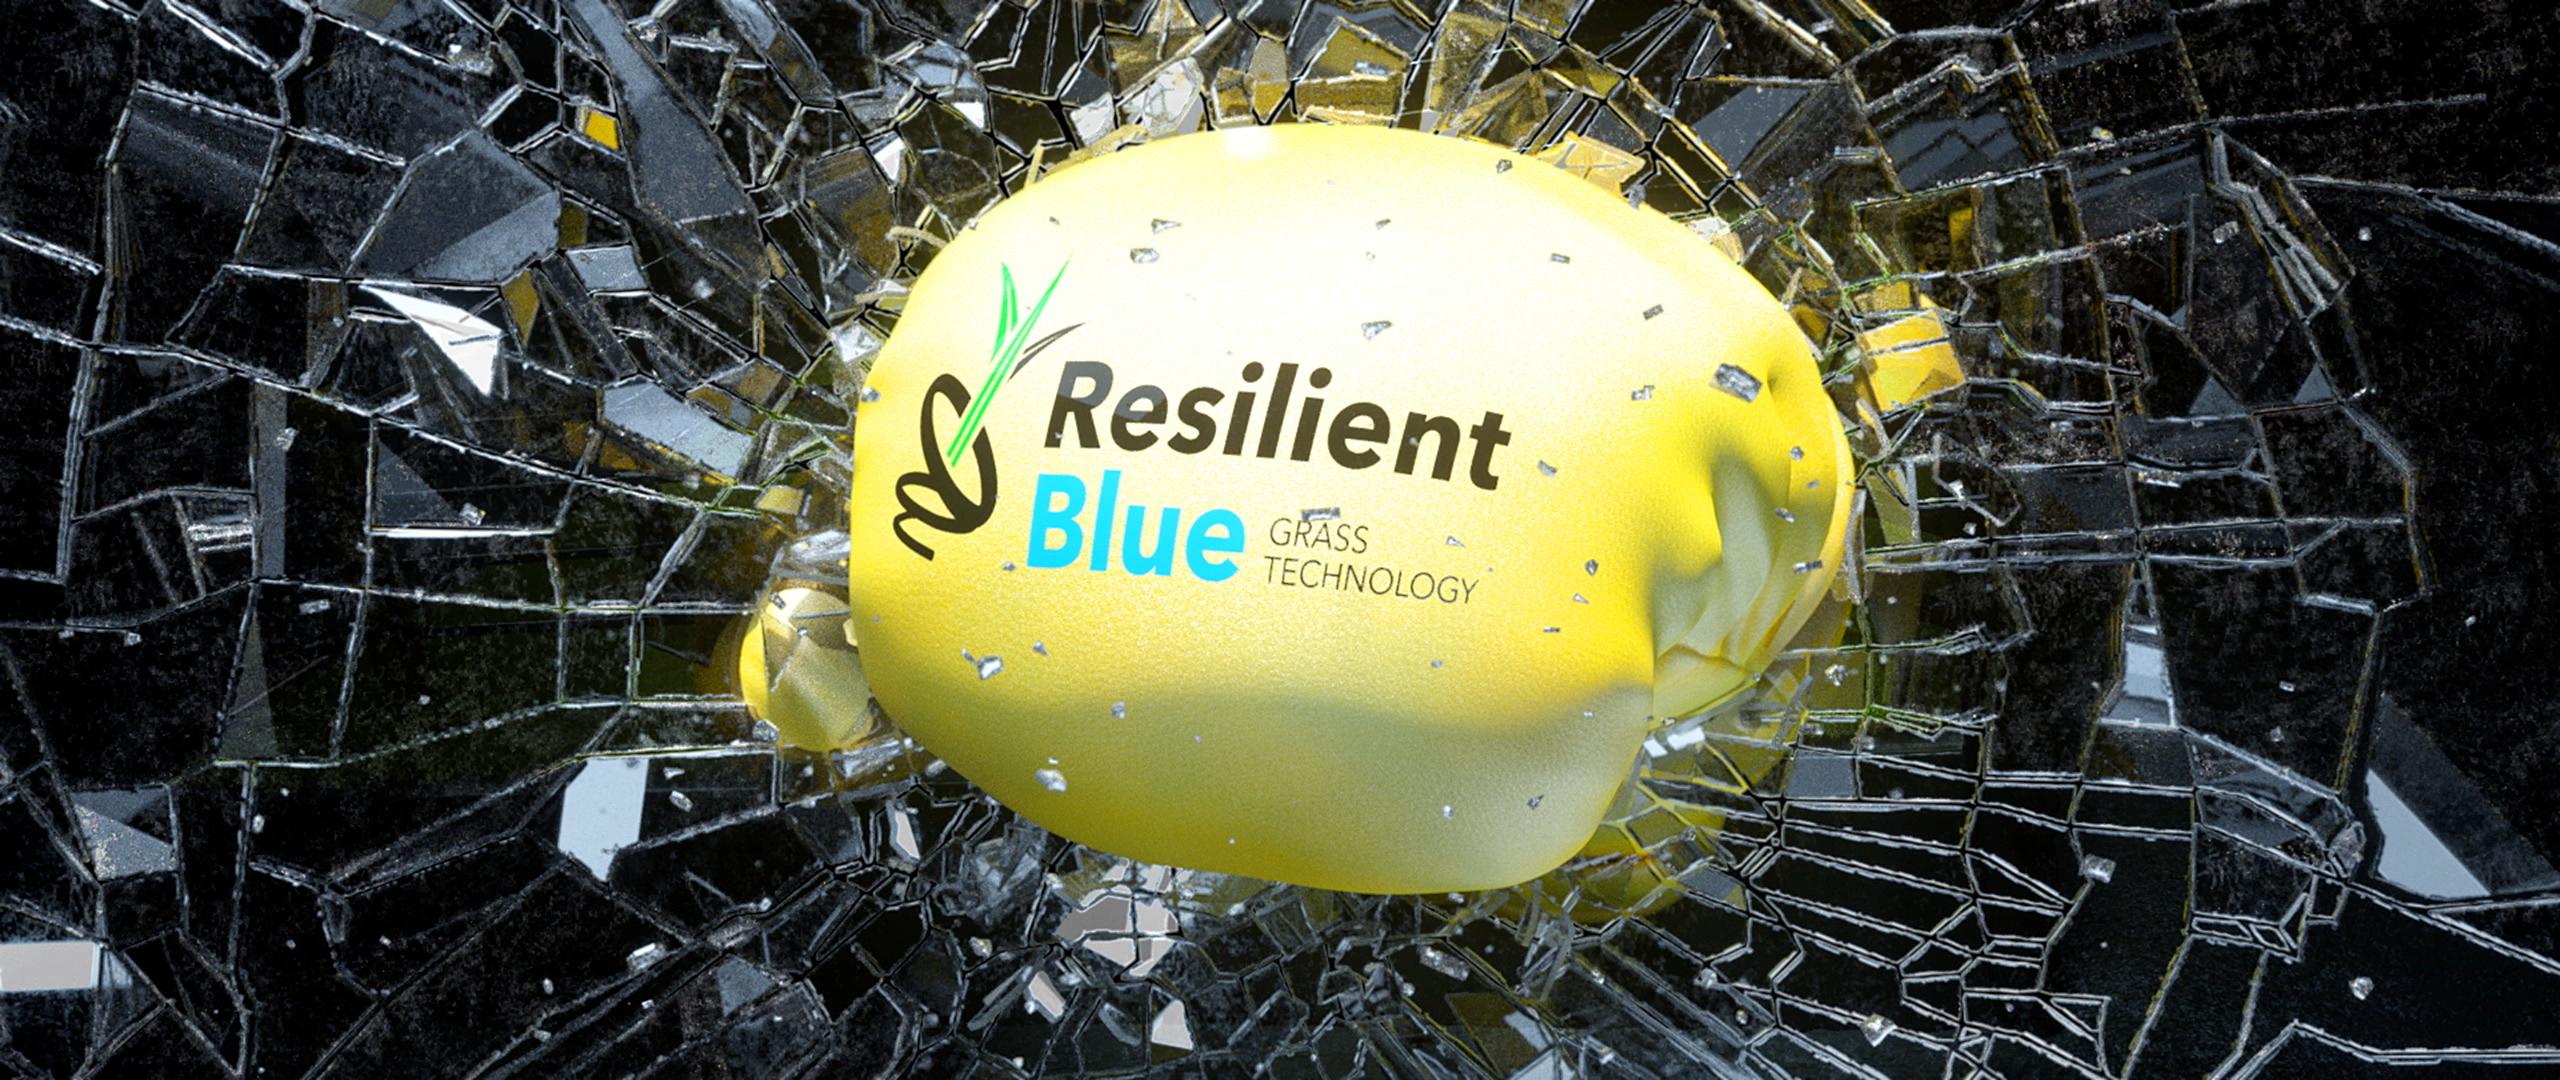 Barenbrug_ResilientBlue_Still_4